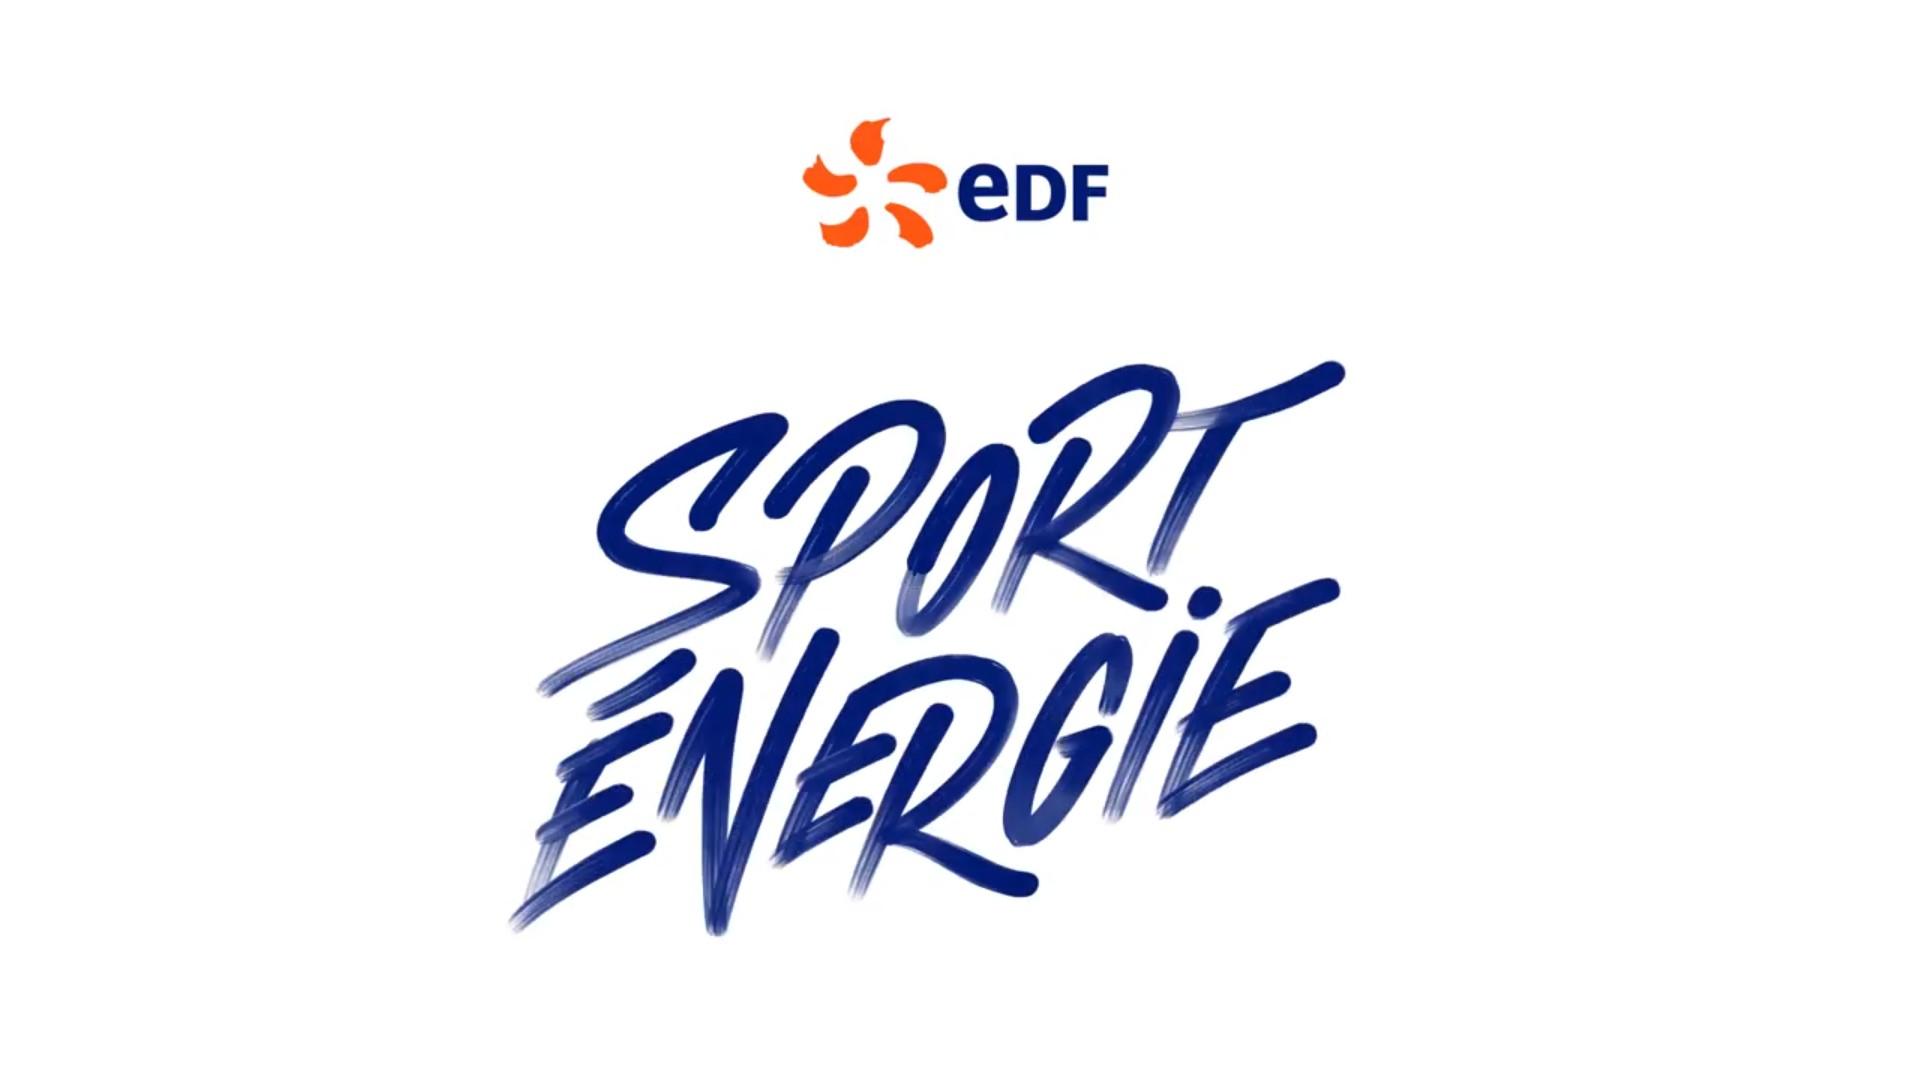 EDF – Sport Energie (application) 2021